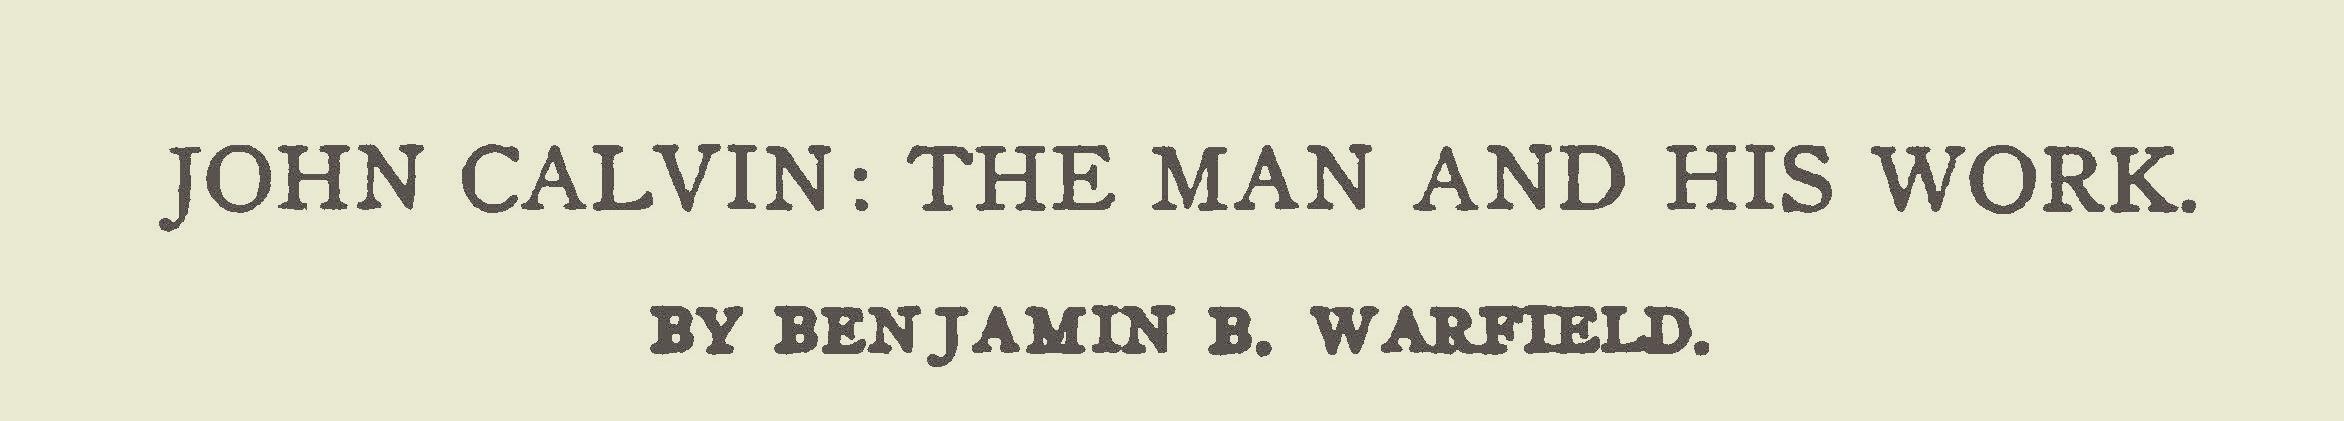 Warfield, Benjamin Breckinridge, John Calvin the Man and His Work Title Page.jpg